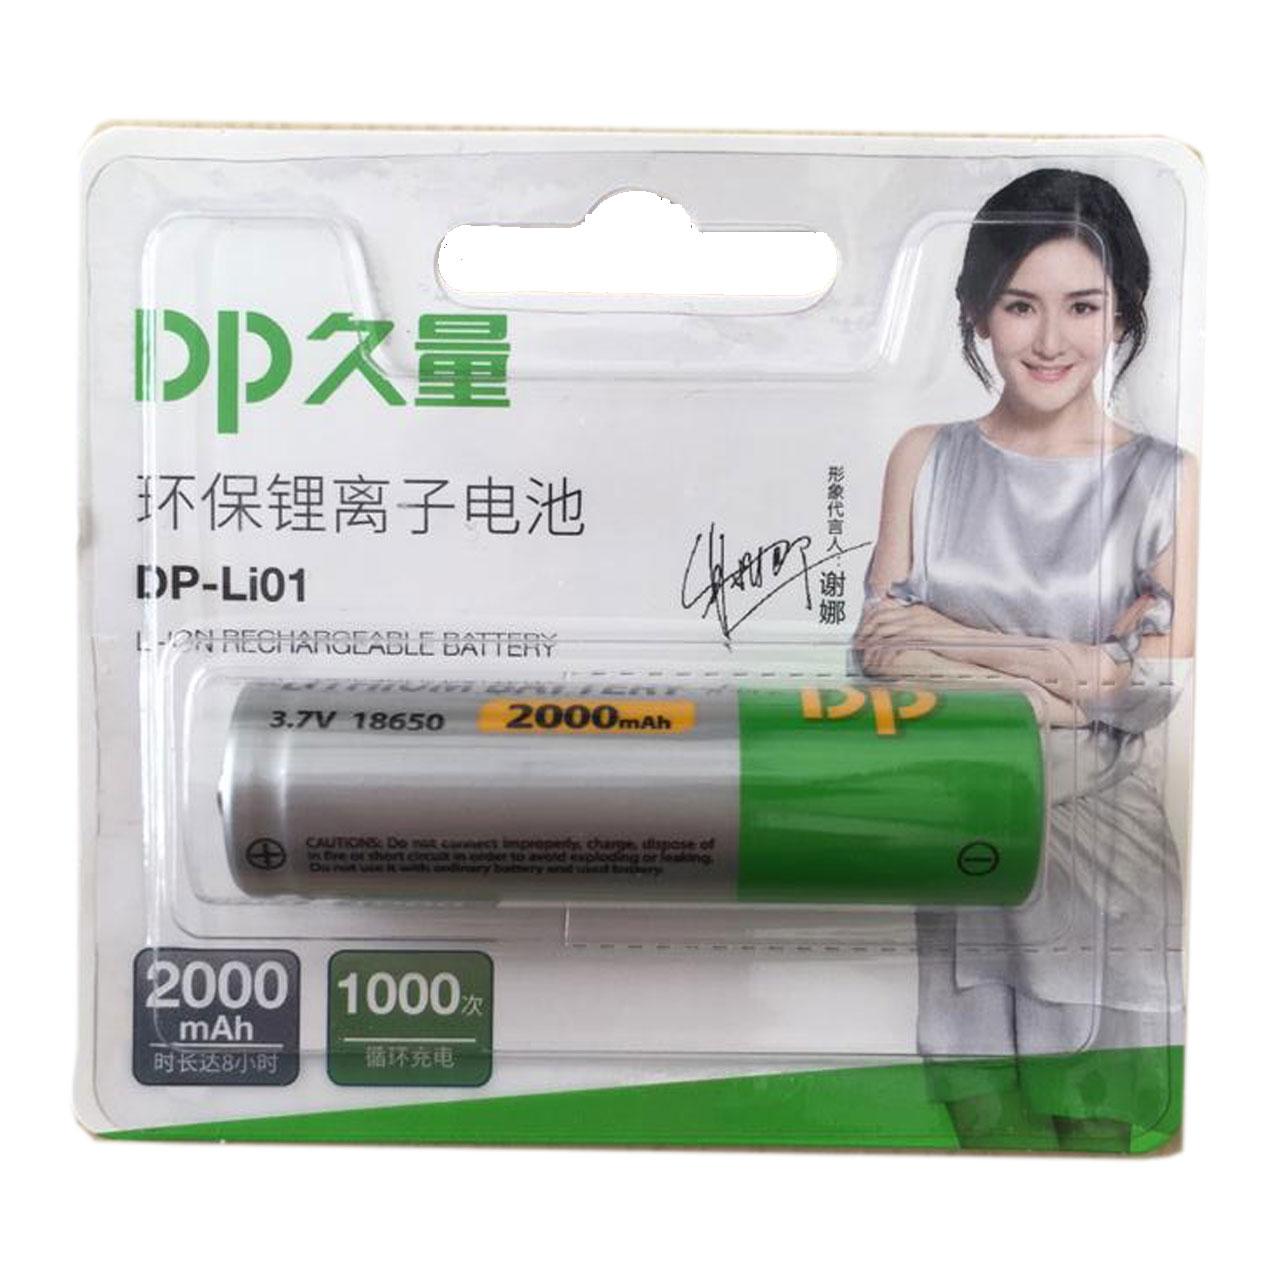 باتری لیتیومی قابل شارژ دی پی مدل DP-LI01 18650 |